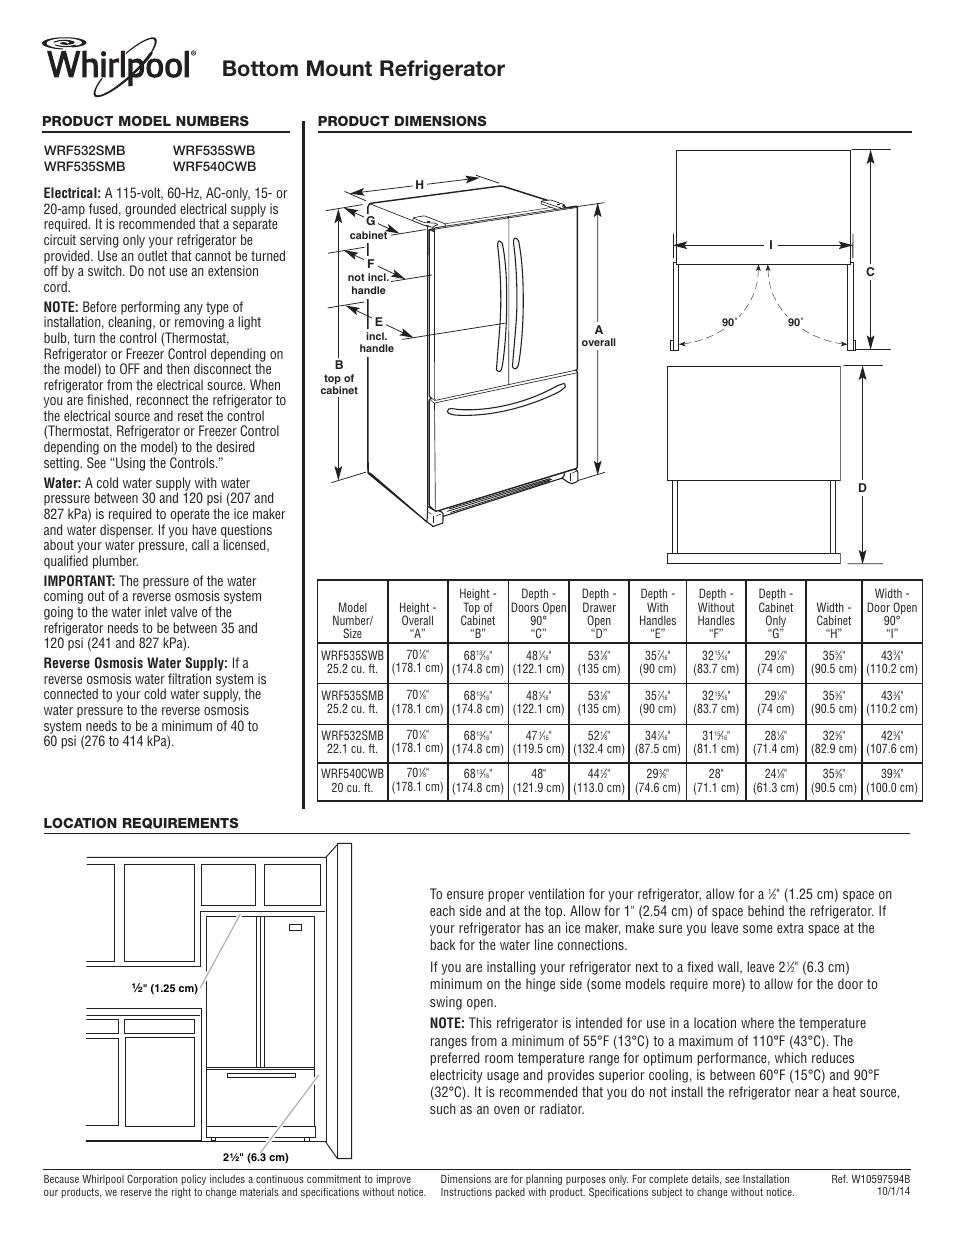 Wiring Diagram For Whirlpool Refrigerator Wrf535smbm00